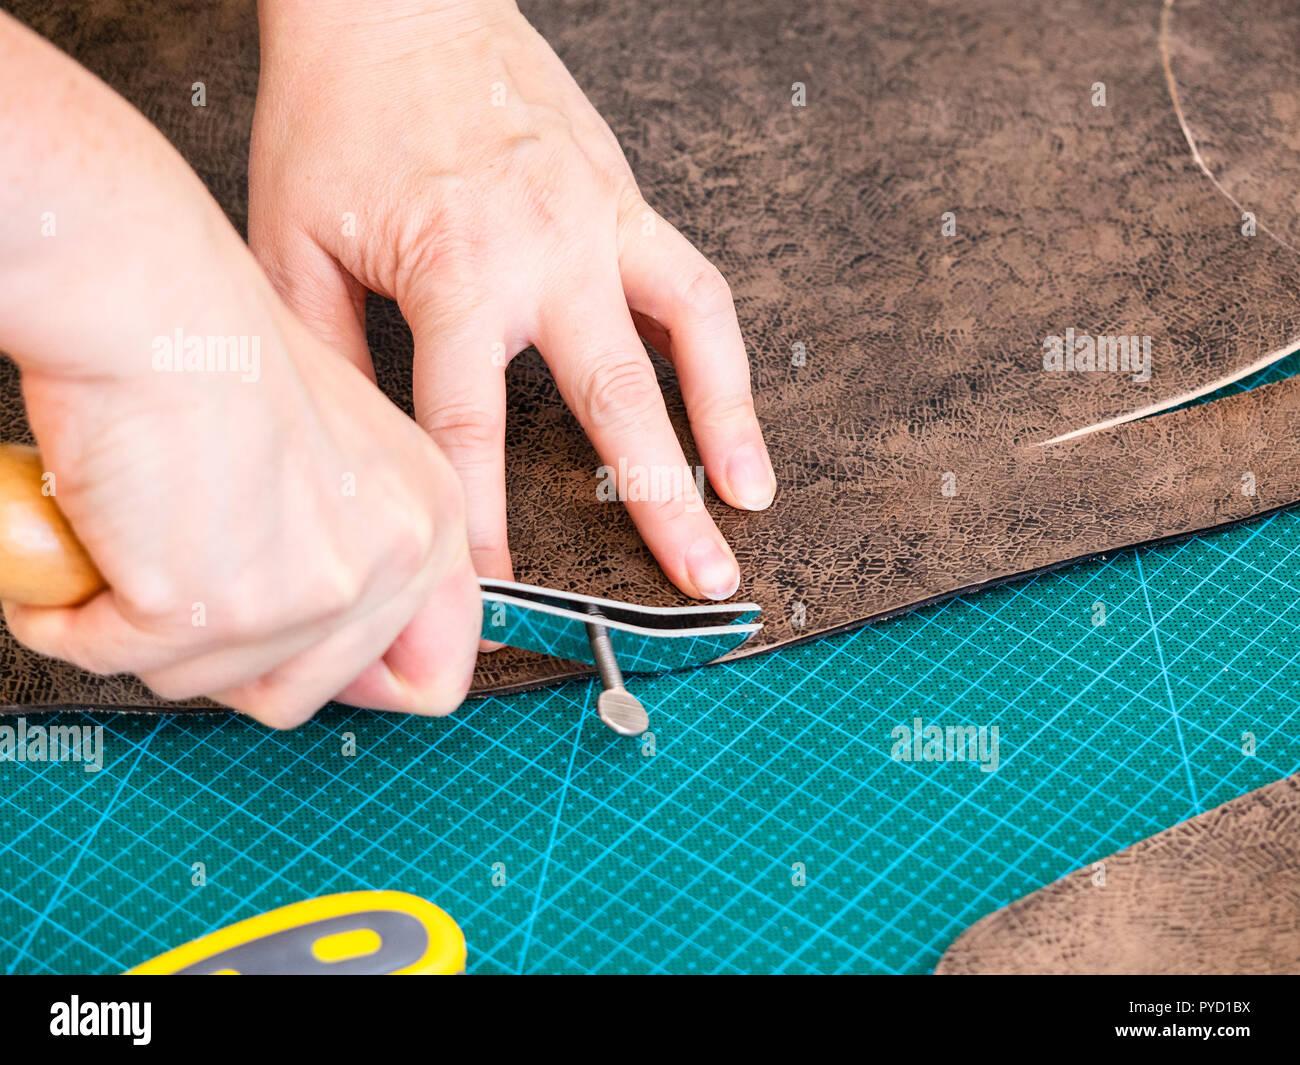 workshop of making the carved leather bag - craftsman marks pattern on the carved leather for handbag by adjustable edge creaser tool - Stock Image